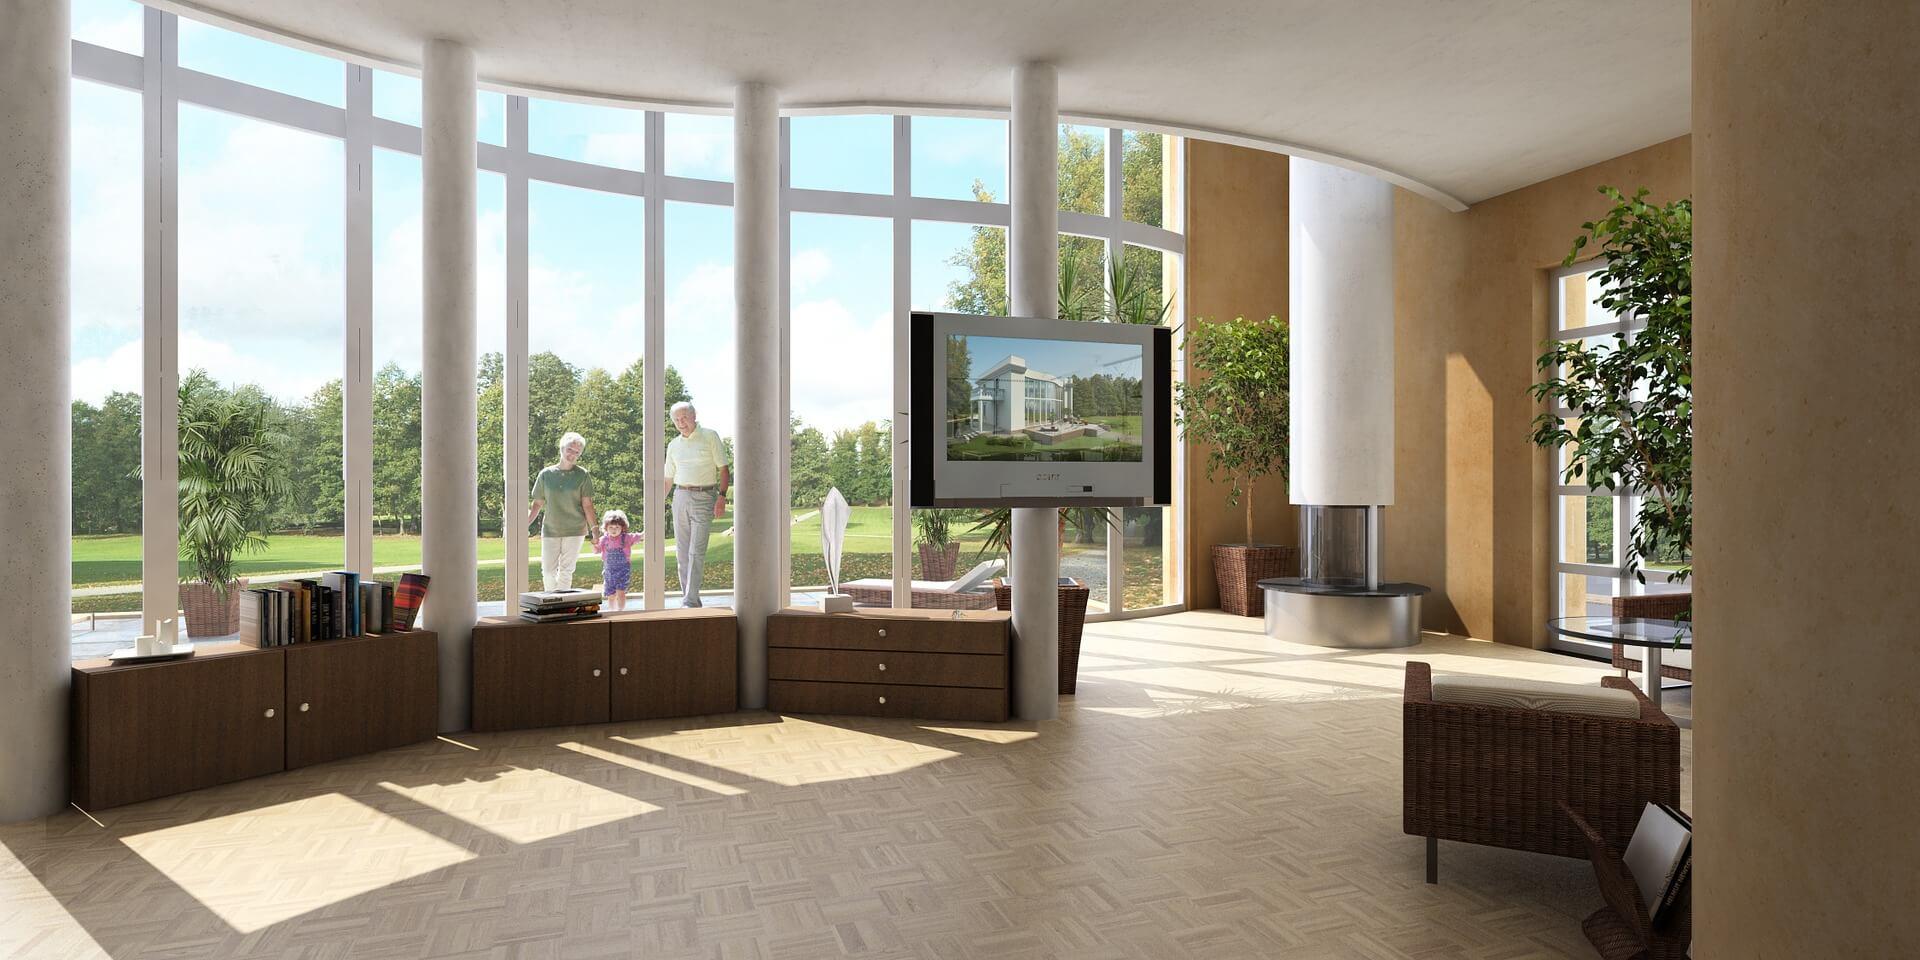 3d Visualization The Key To Interior Design Interior Design Design News And Architecture Trends